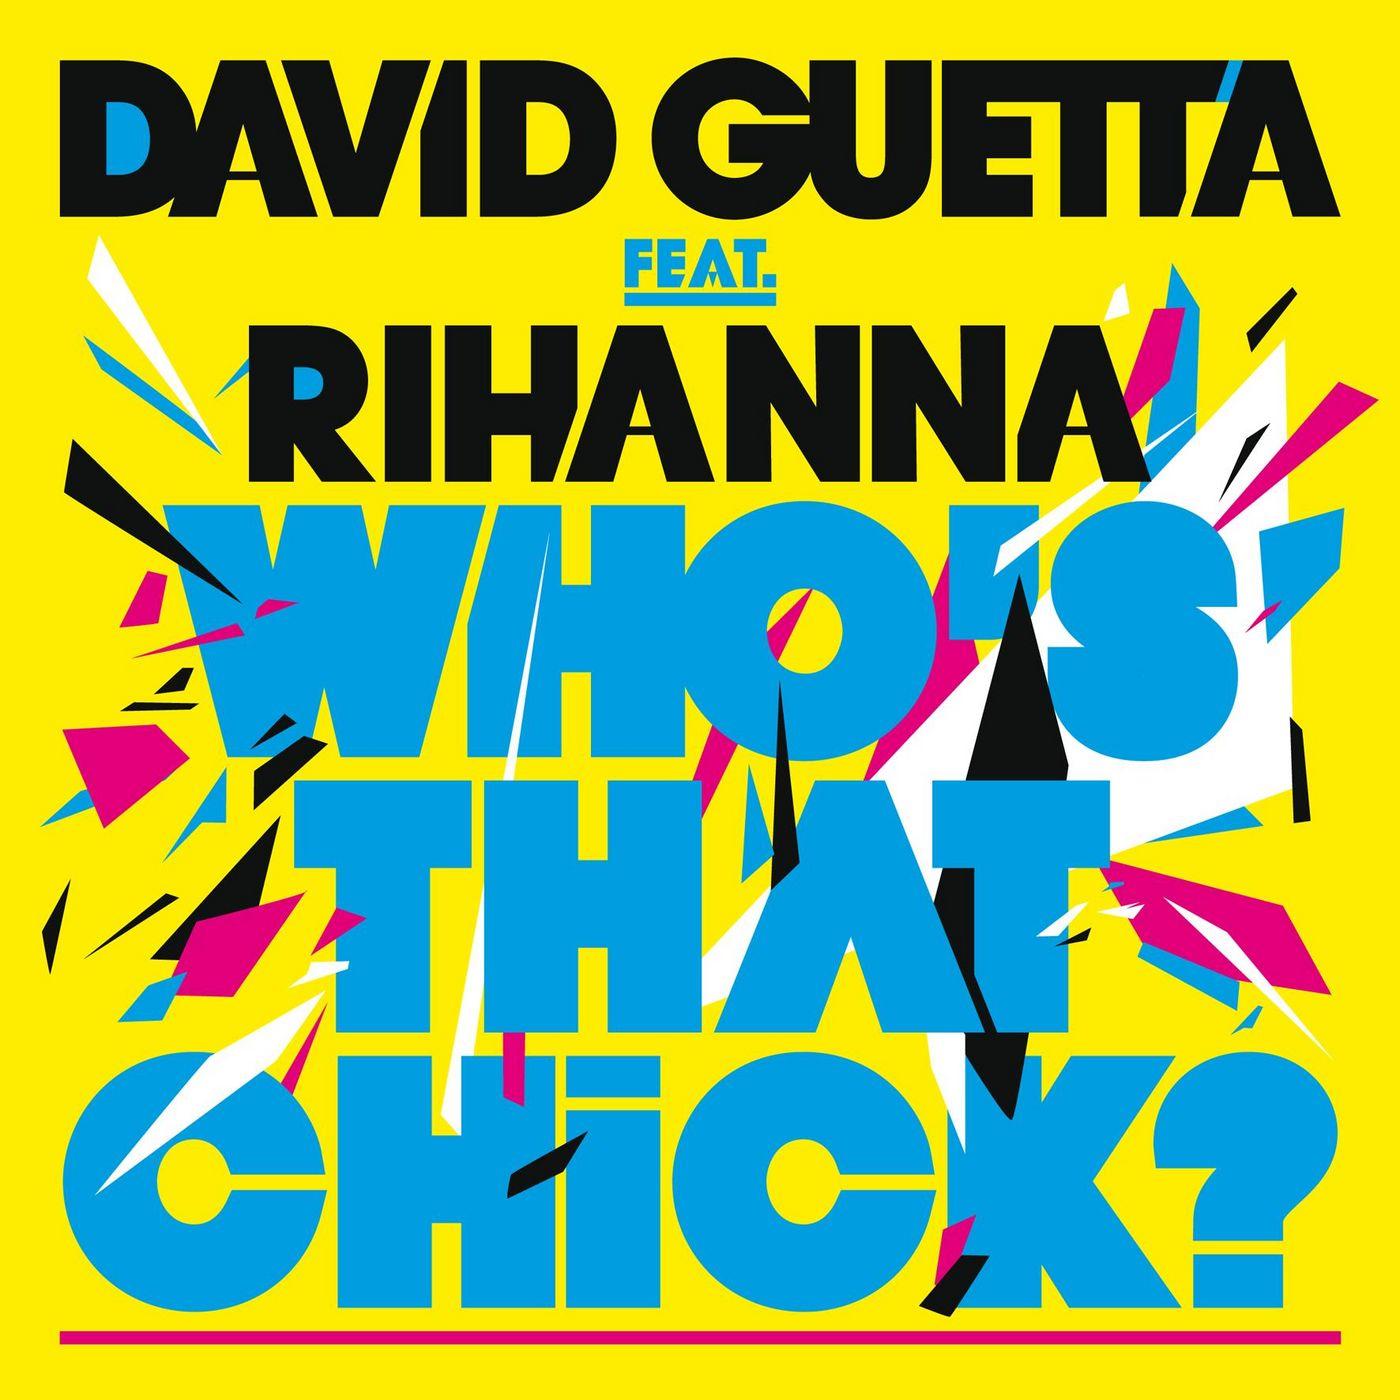 http://2.bp.blogspot.com/-rImlk8iwzio/T11i_pGoLGI/AAAAAAAAAvY/T8R-sEuaRtM/s1600/David-Guetta-Ft-Rihanna-Whos-That-Chick.jpg